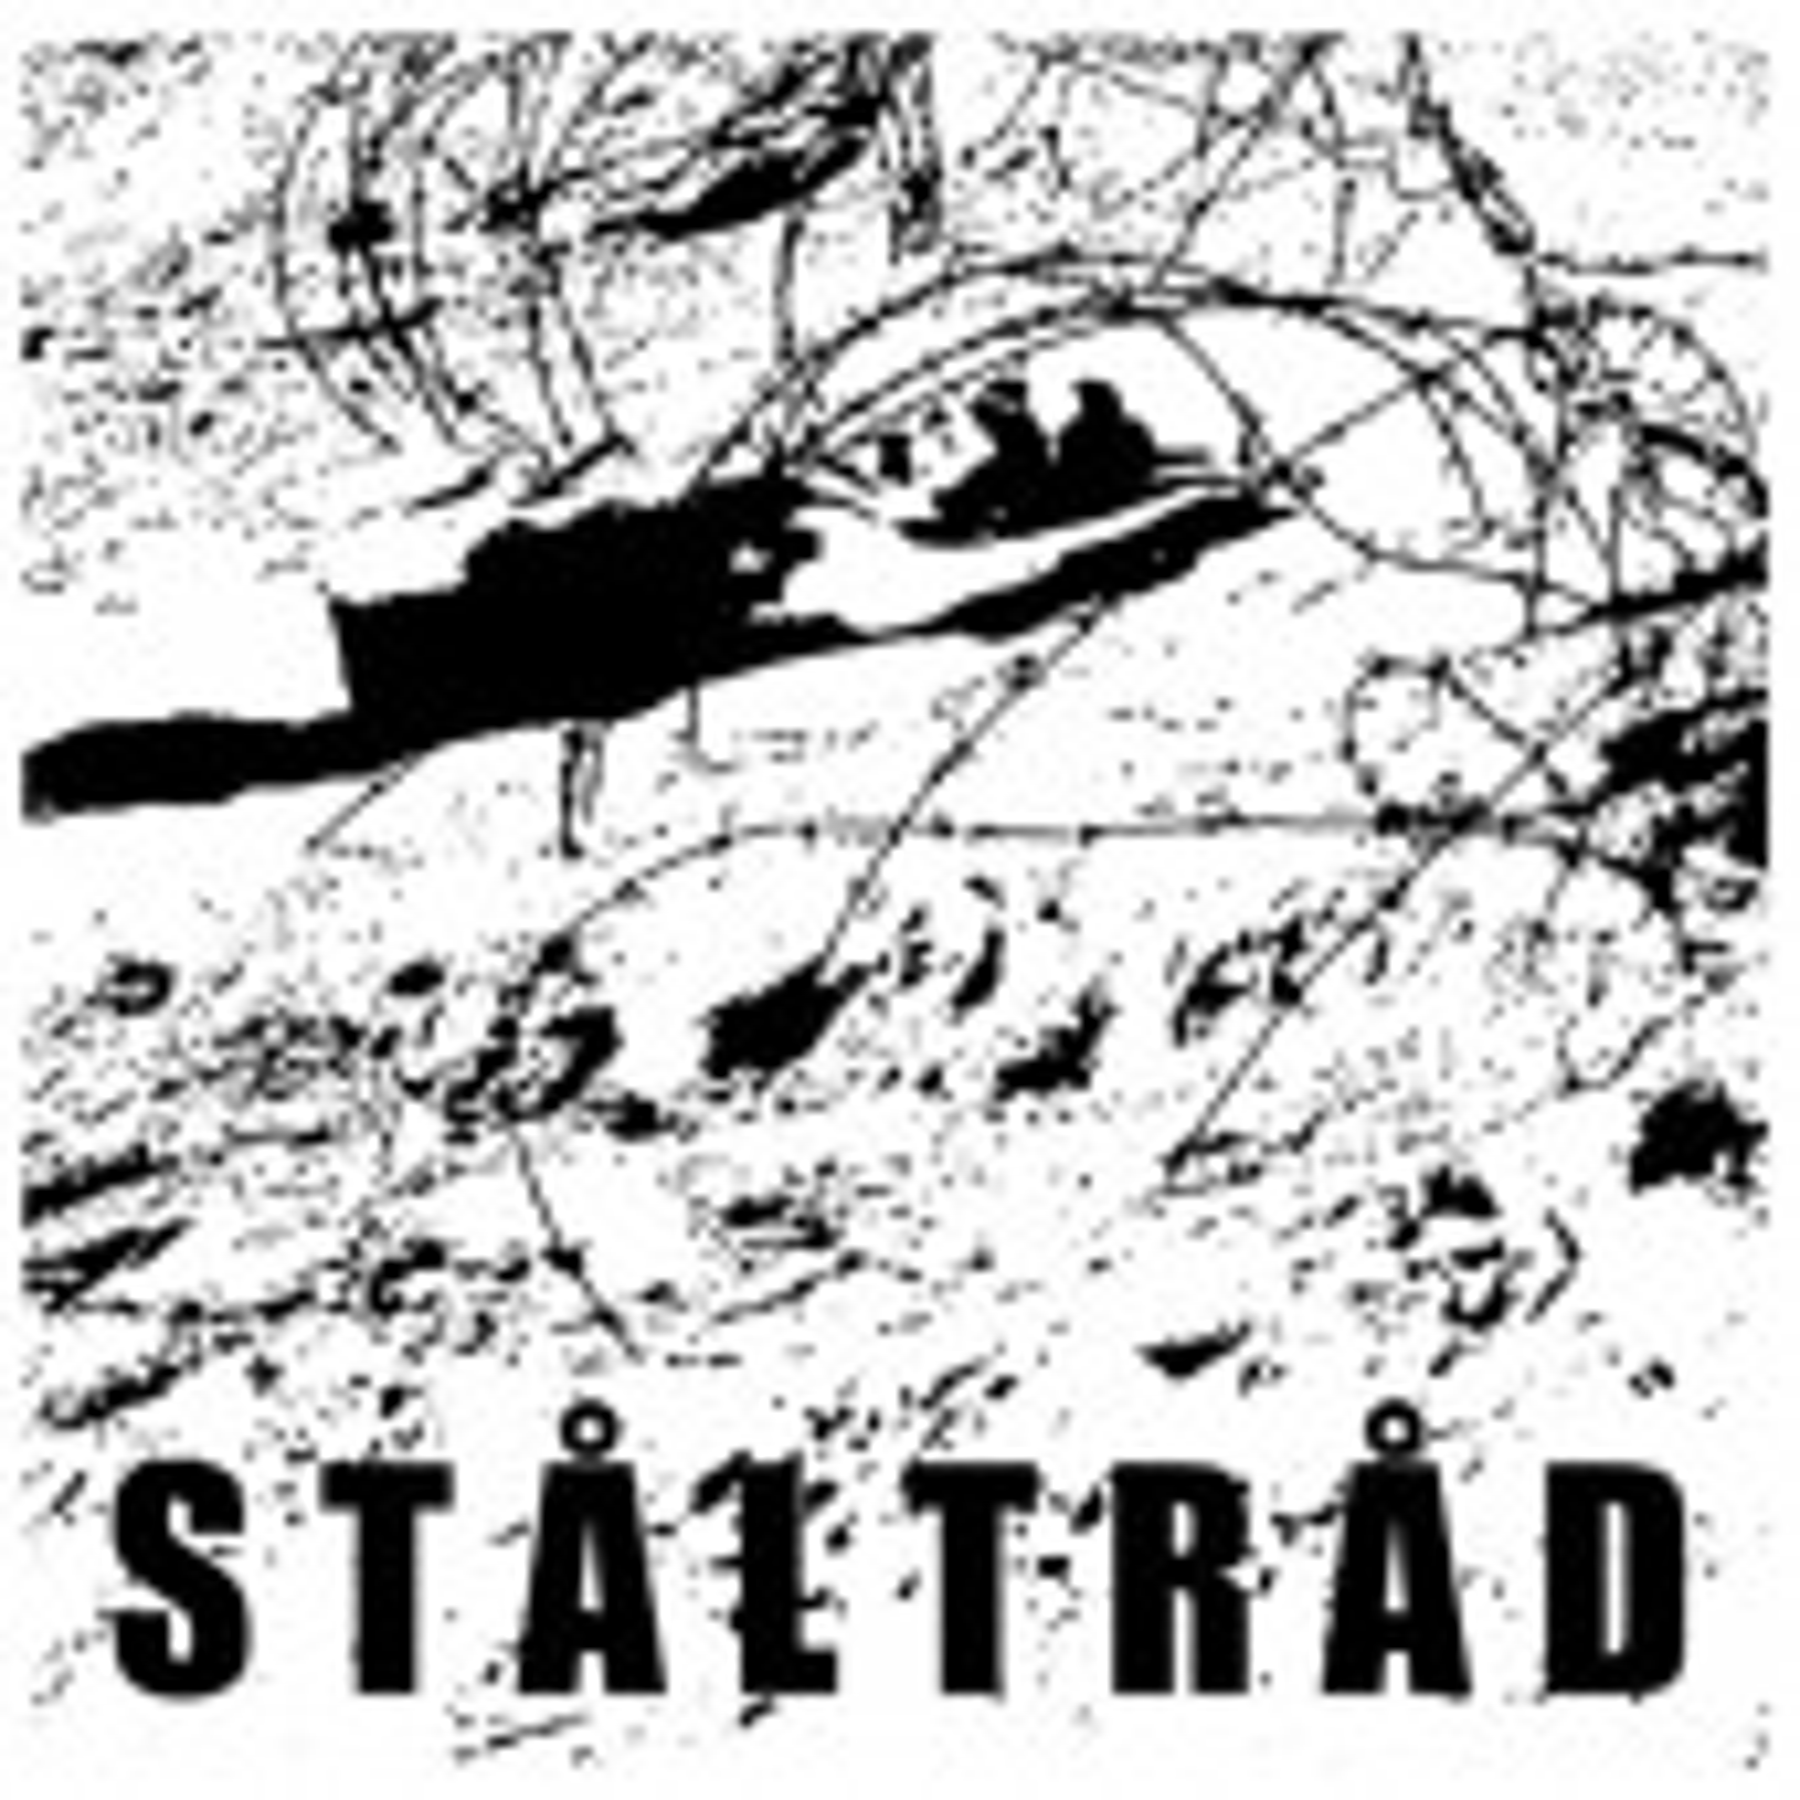 Stälträd - Ståltråd - LP